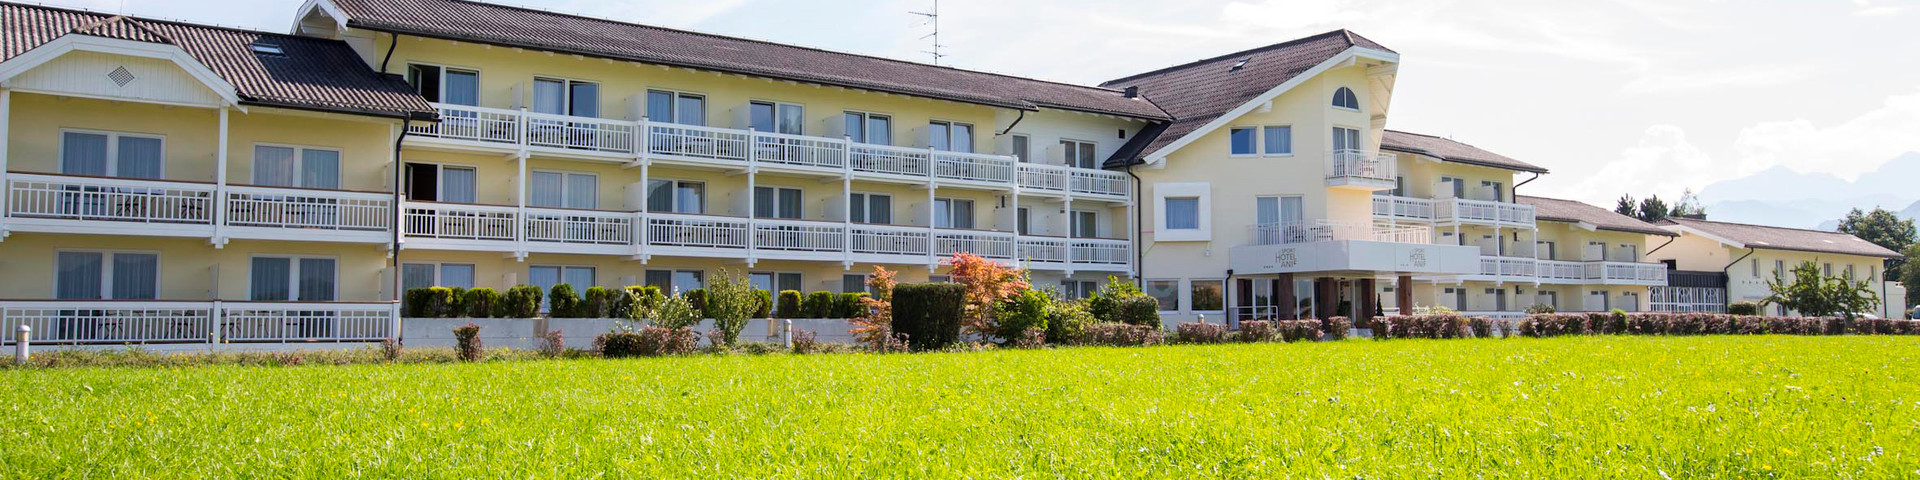 Hotel Momentum Anif - Aussenansicht © Hotel Momentum